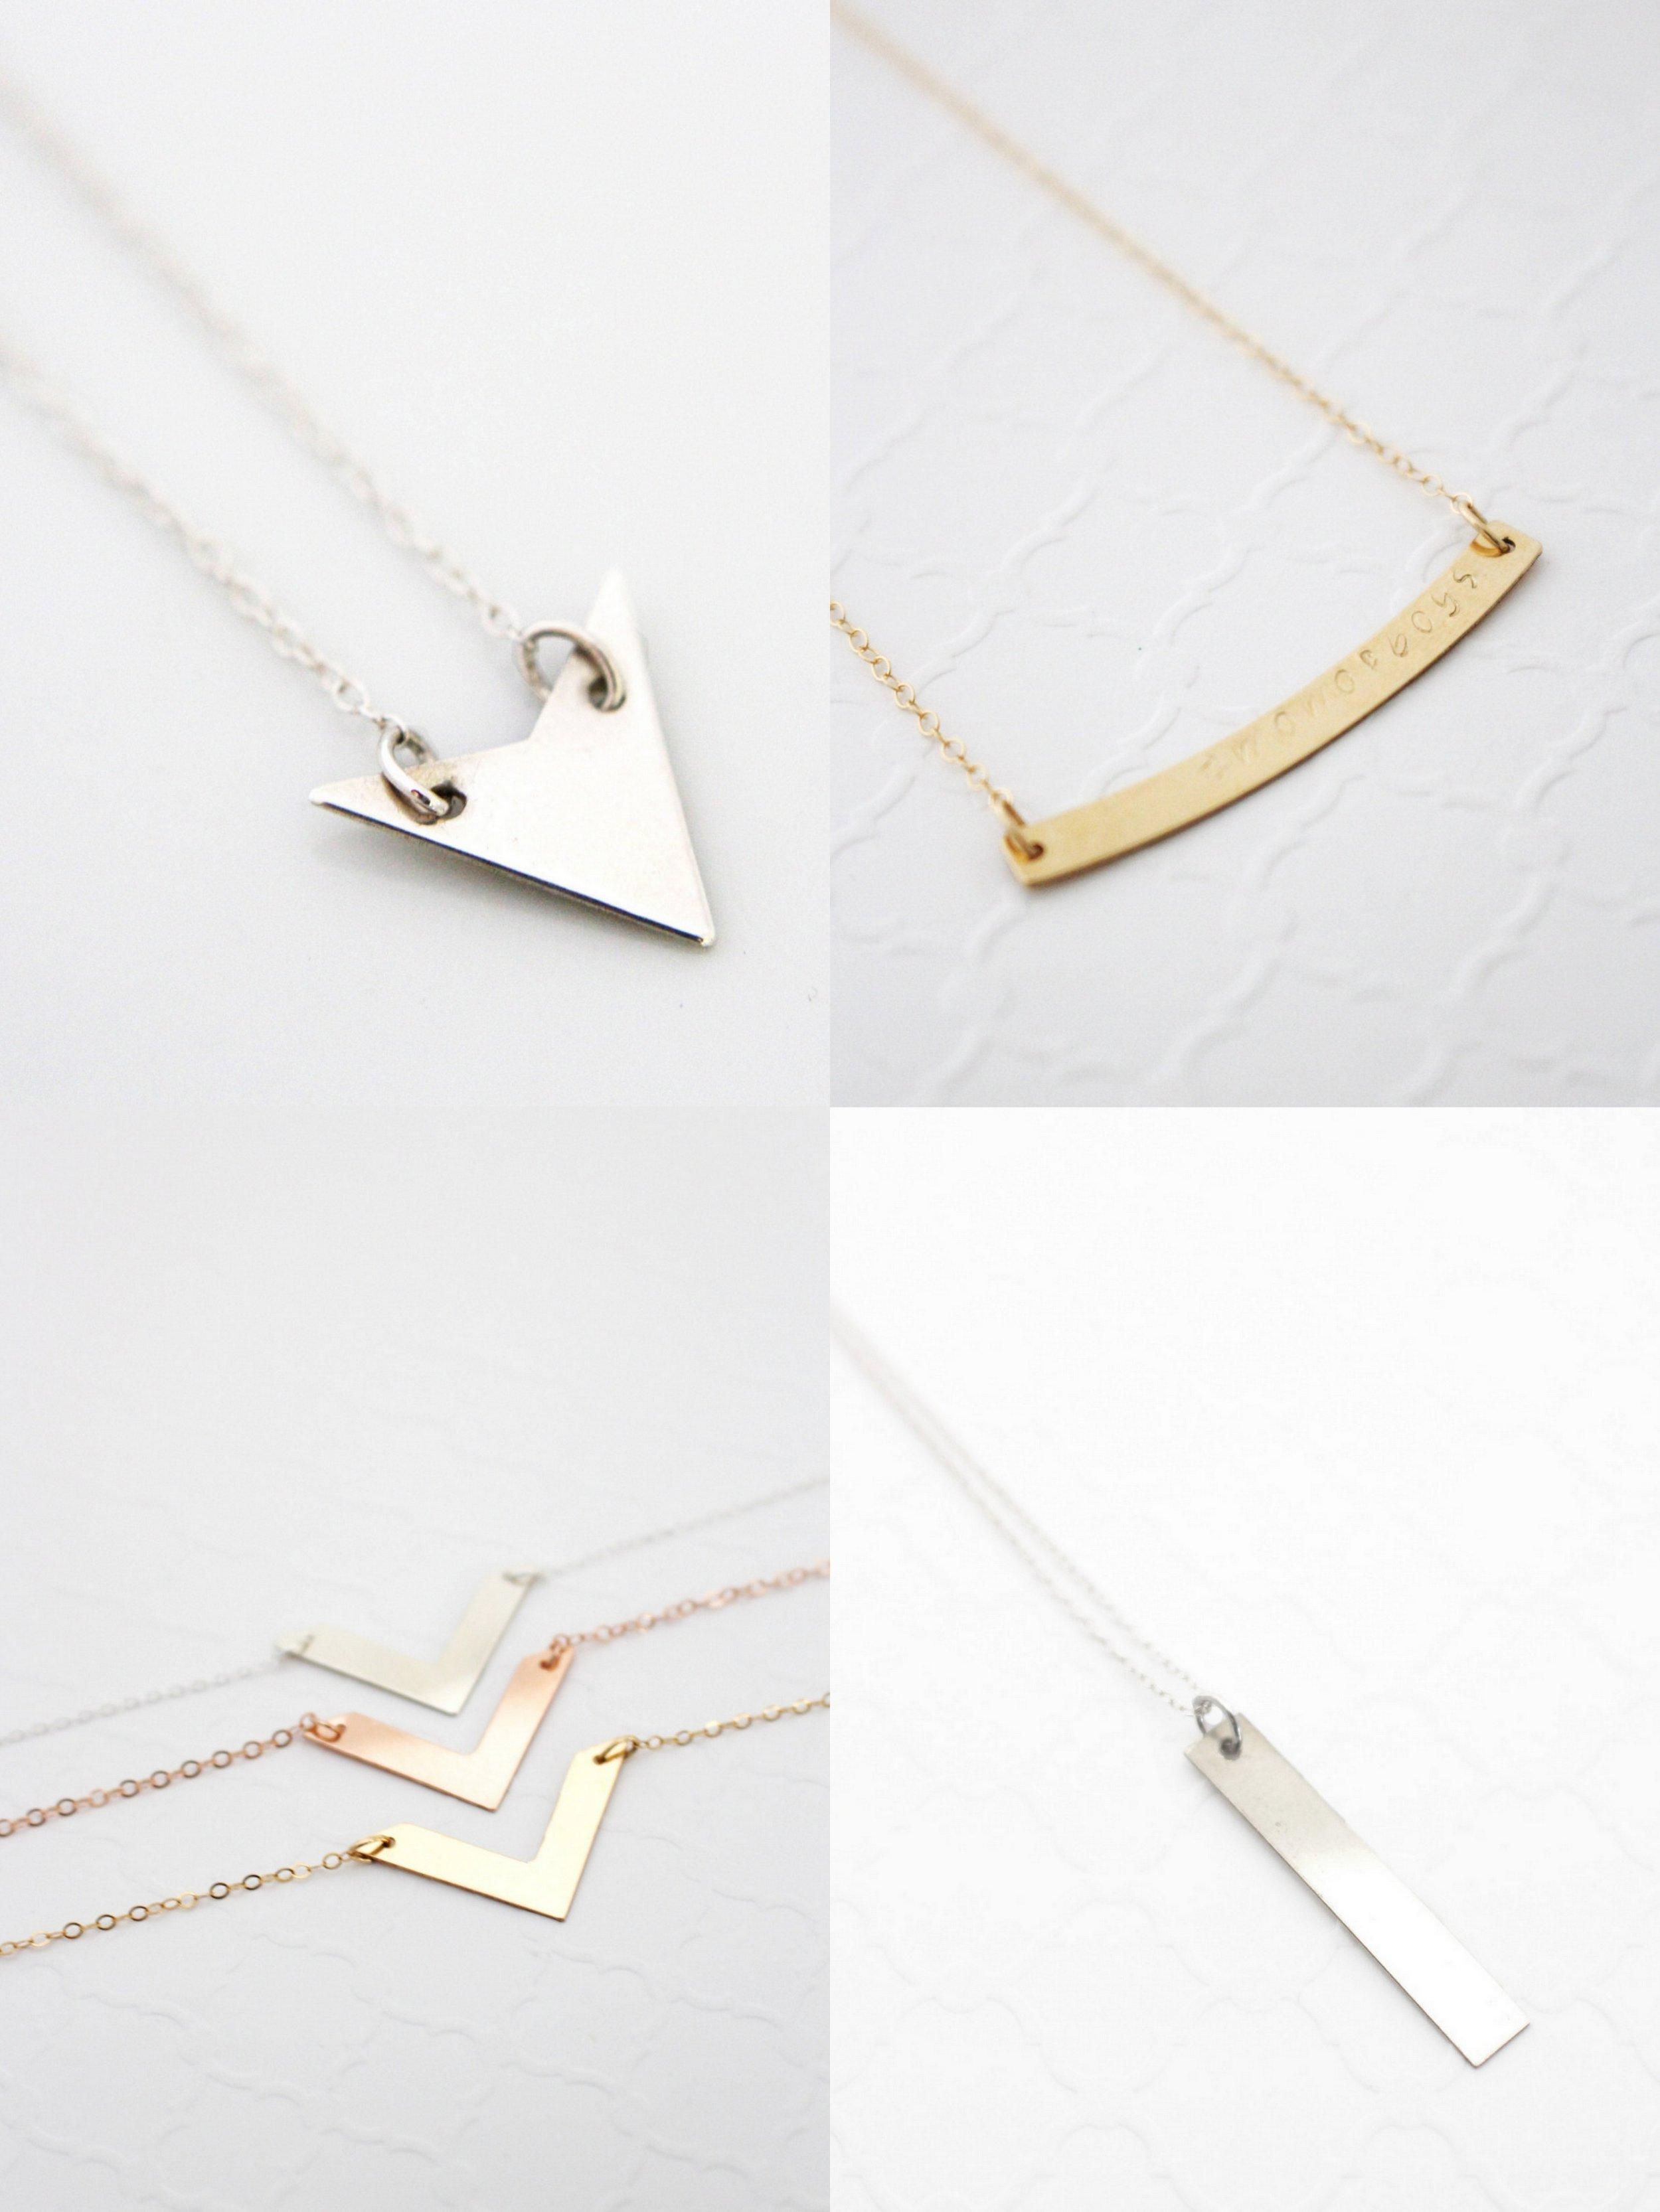 Arrow Necklace - Chevron Necklace - Vertical Bar Necklace - Curved Bar Necklace